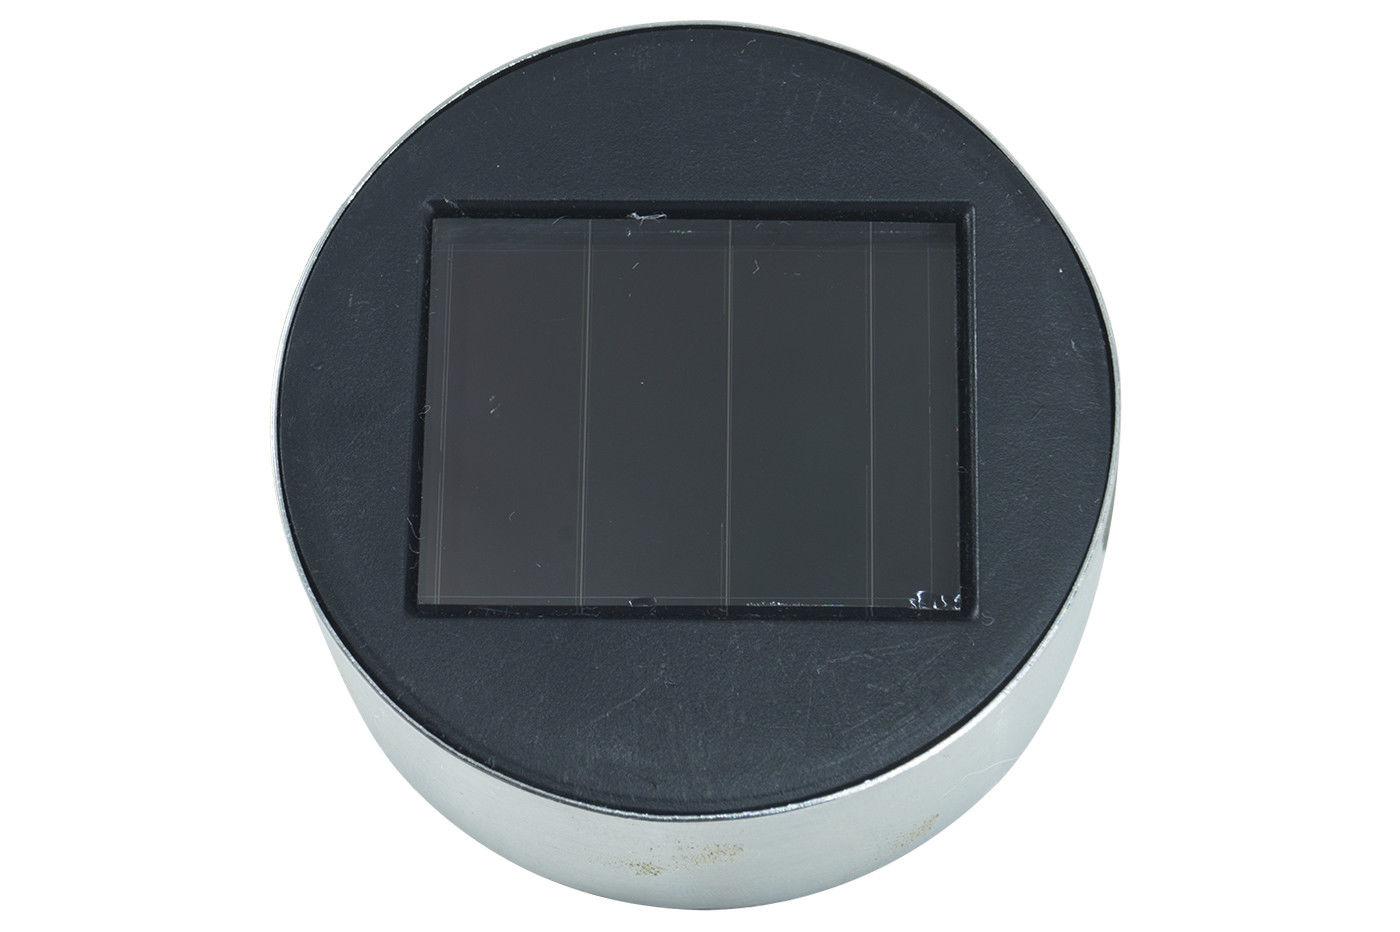 Bes 24353 illuminazione ad energia solare beselettronica 5pz